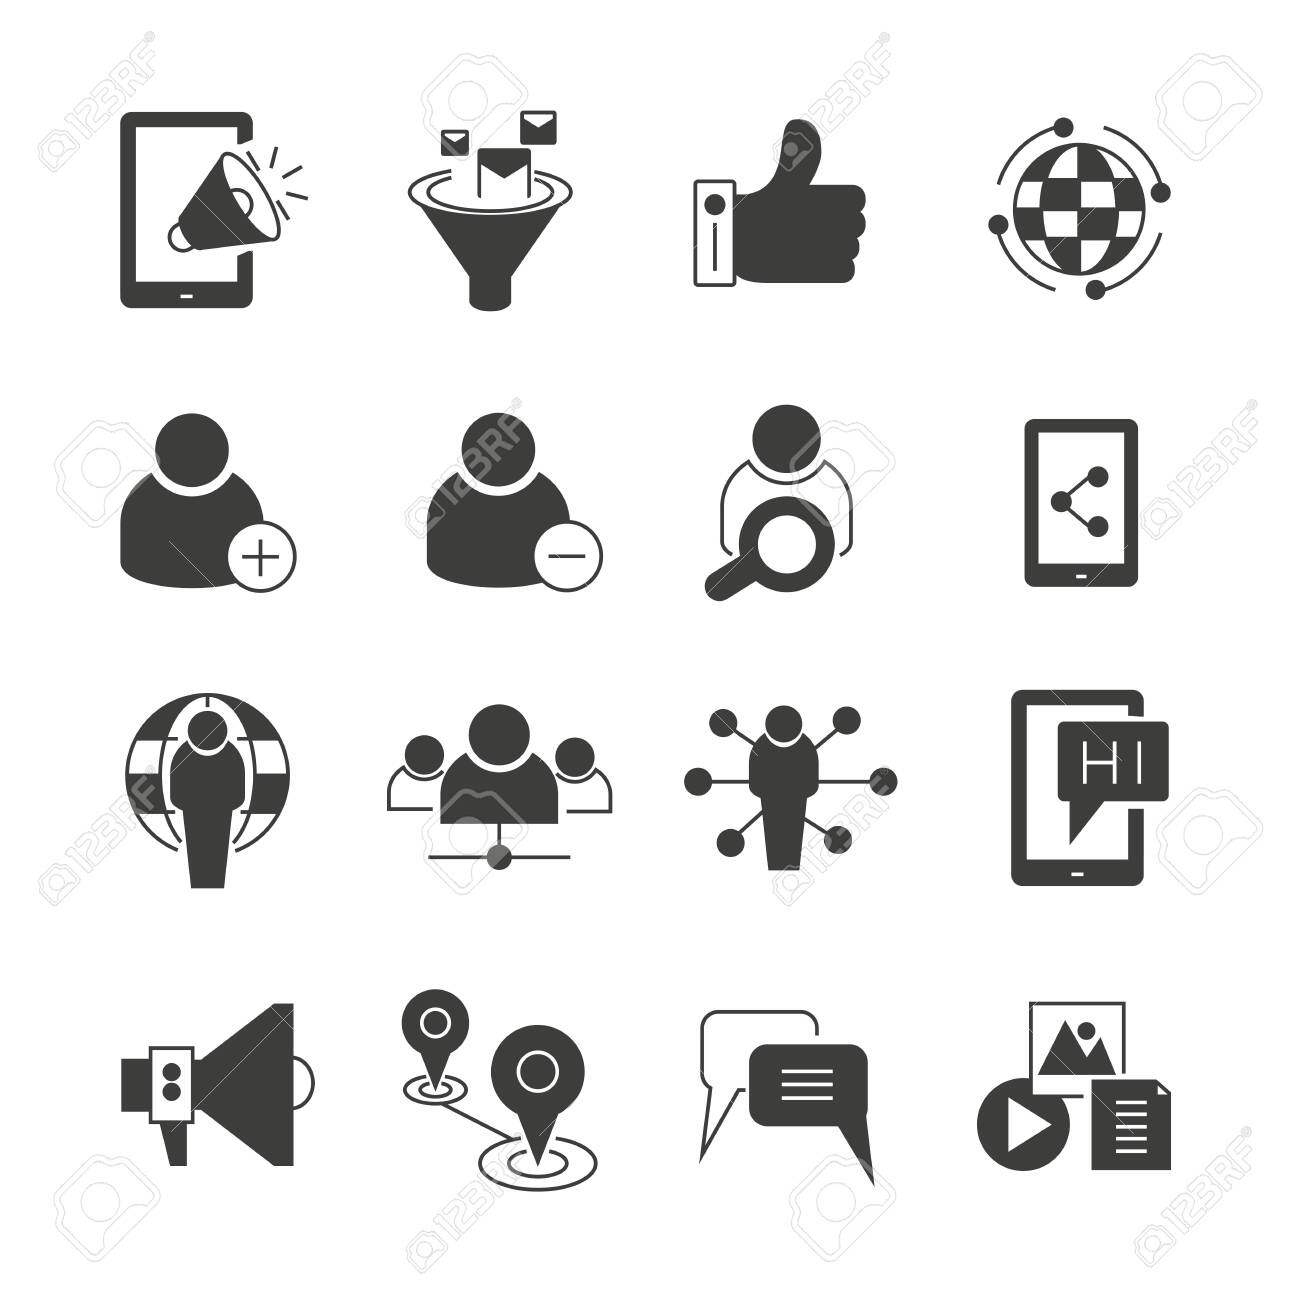 social media, seo and network icons set - 122058308